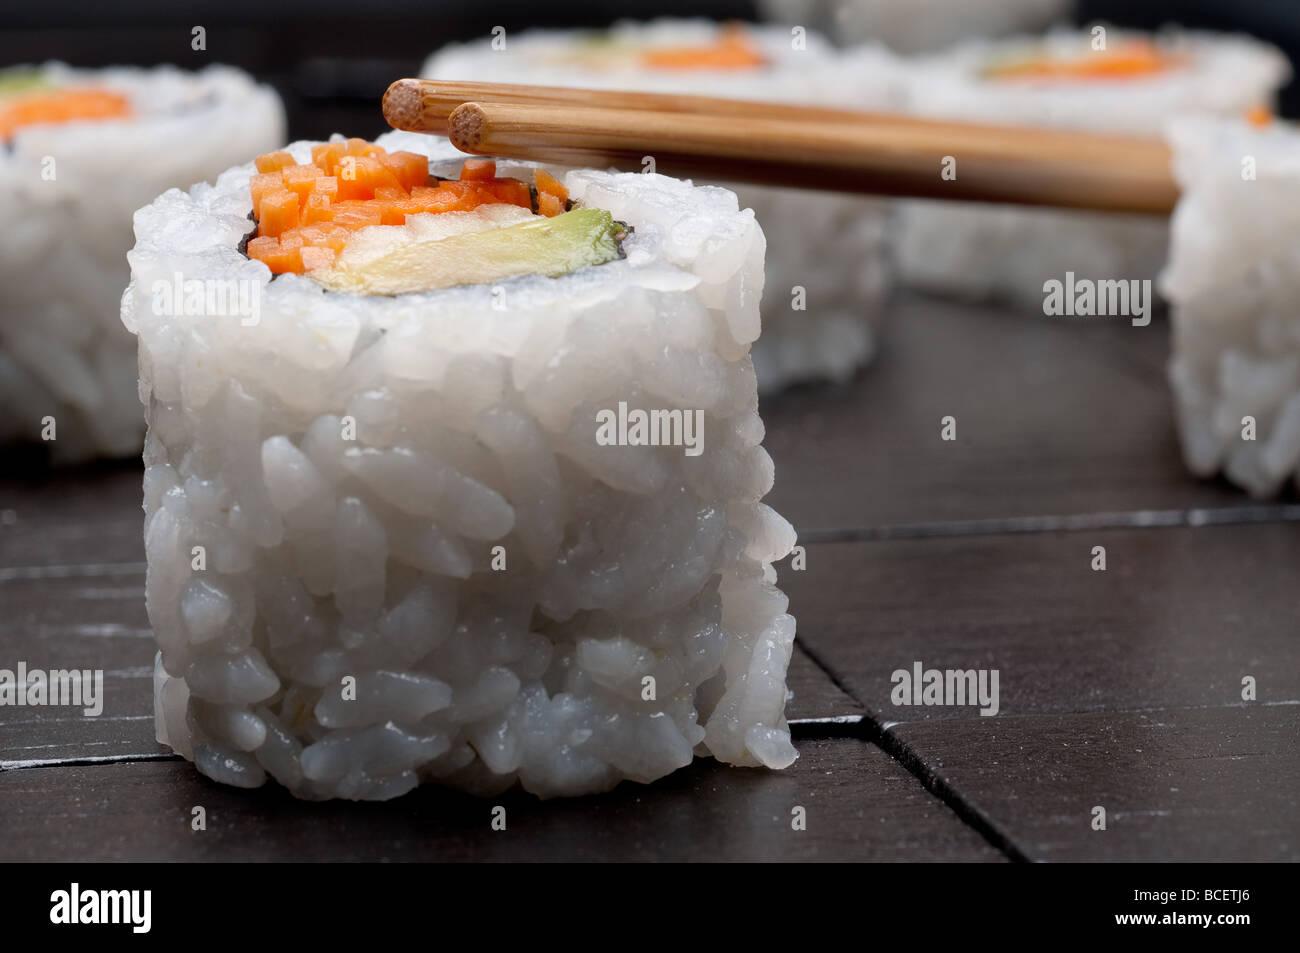 Enfoque macro superficial horizontal de sushi con copsticks sobre un fondo de madera negra Imagen De Stock